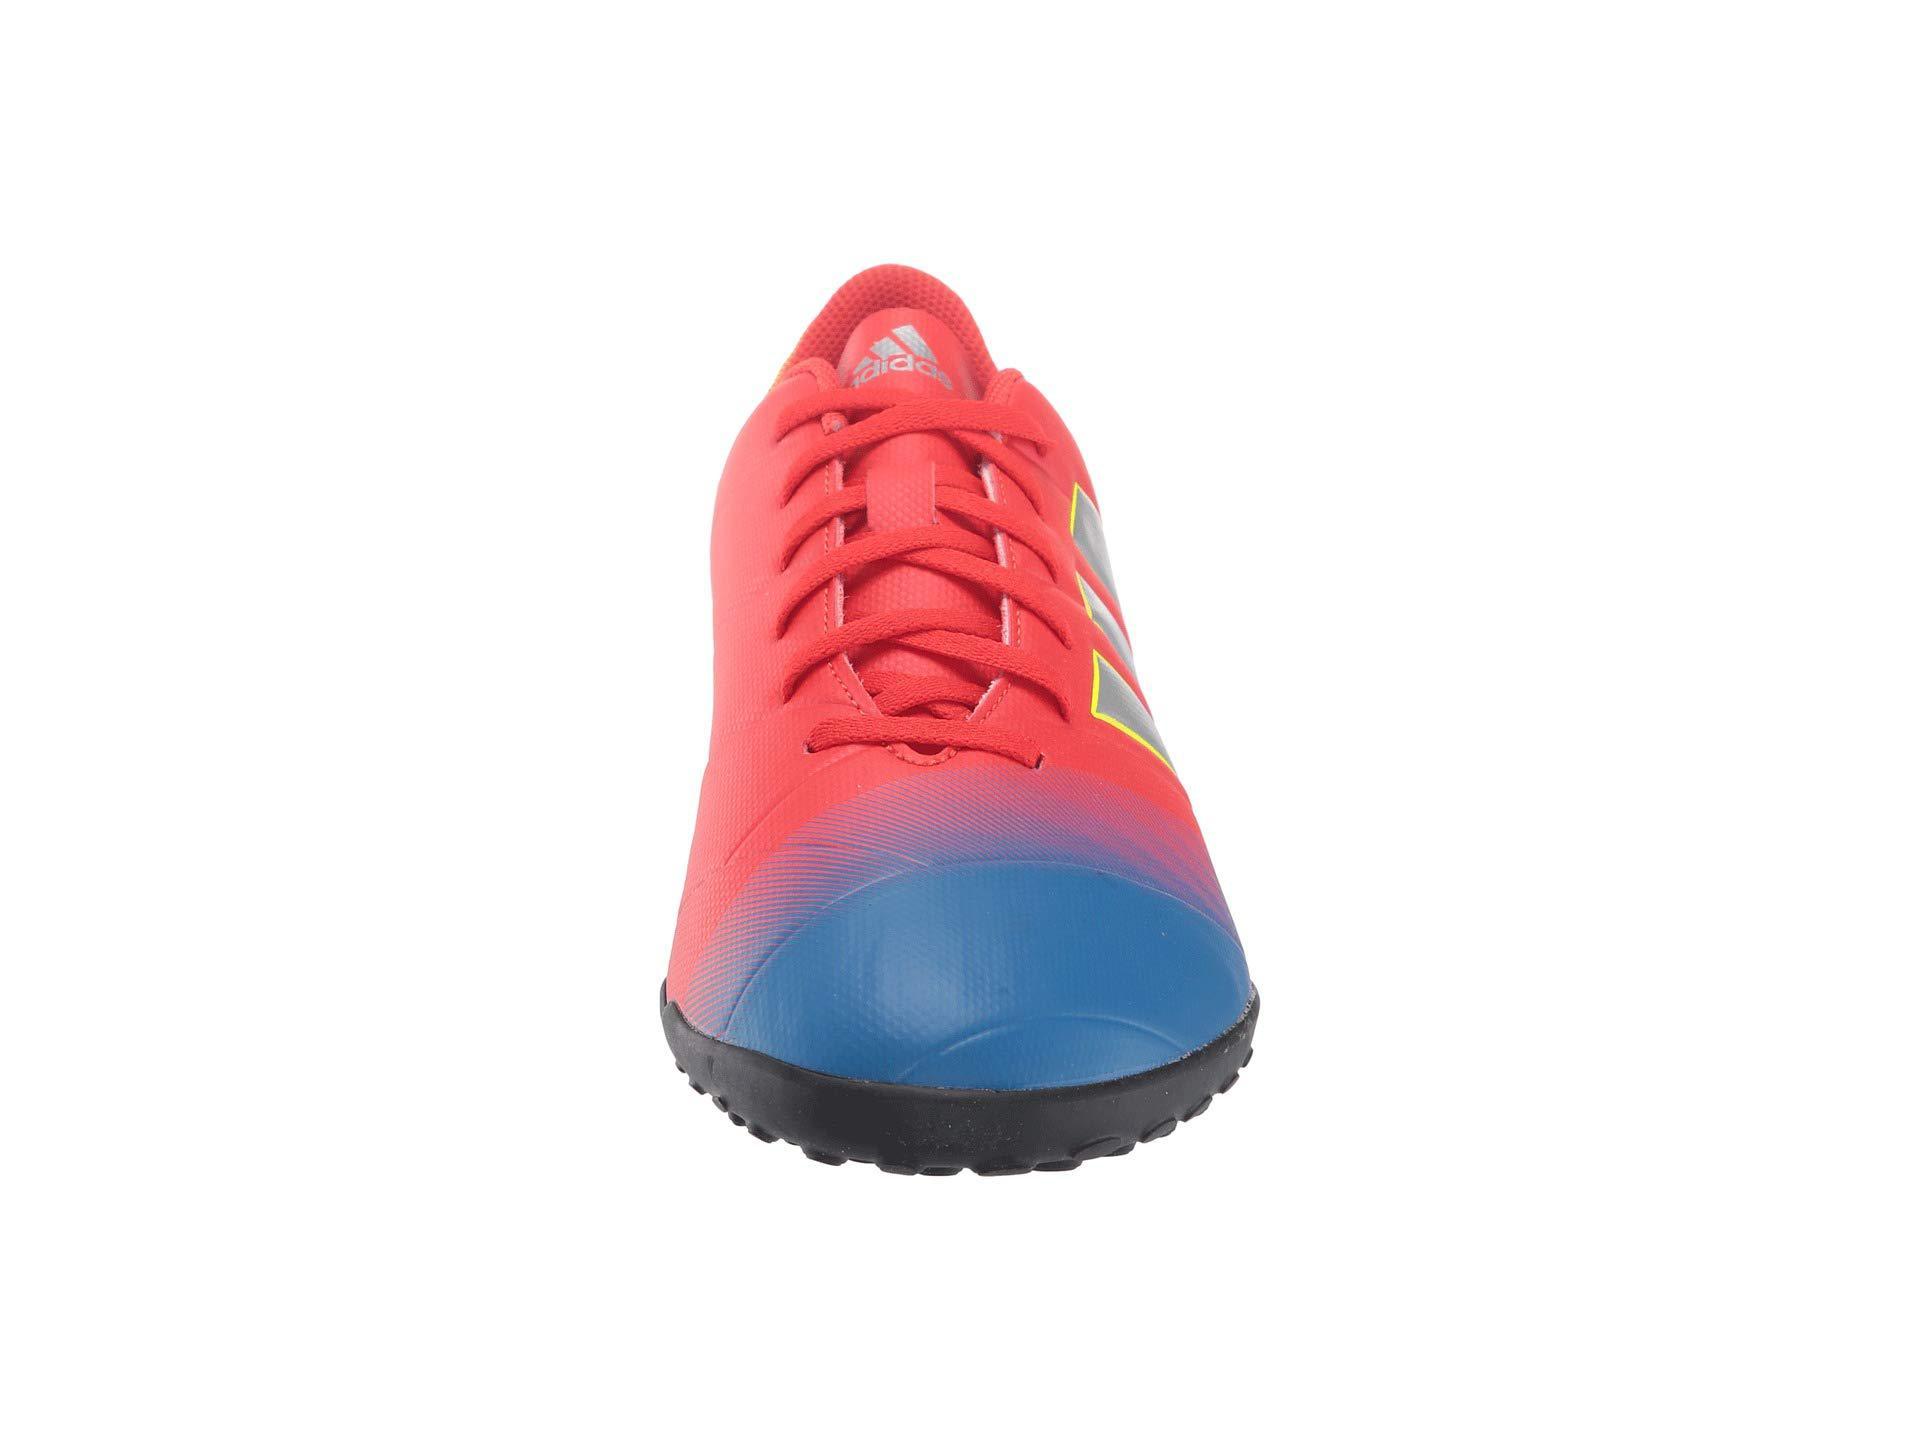 4795c4b1b2a Adidas - Multicolor Nemeziz Messi 18.4 Tf (active Red silver Metallic football  Blue. View fullscreen